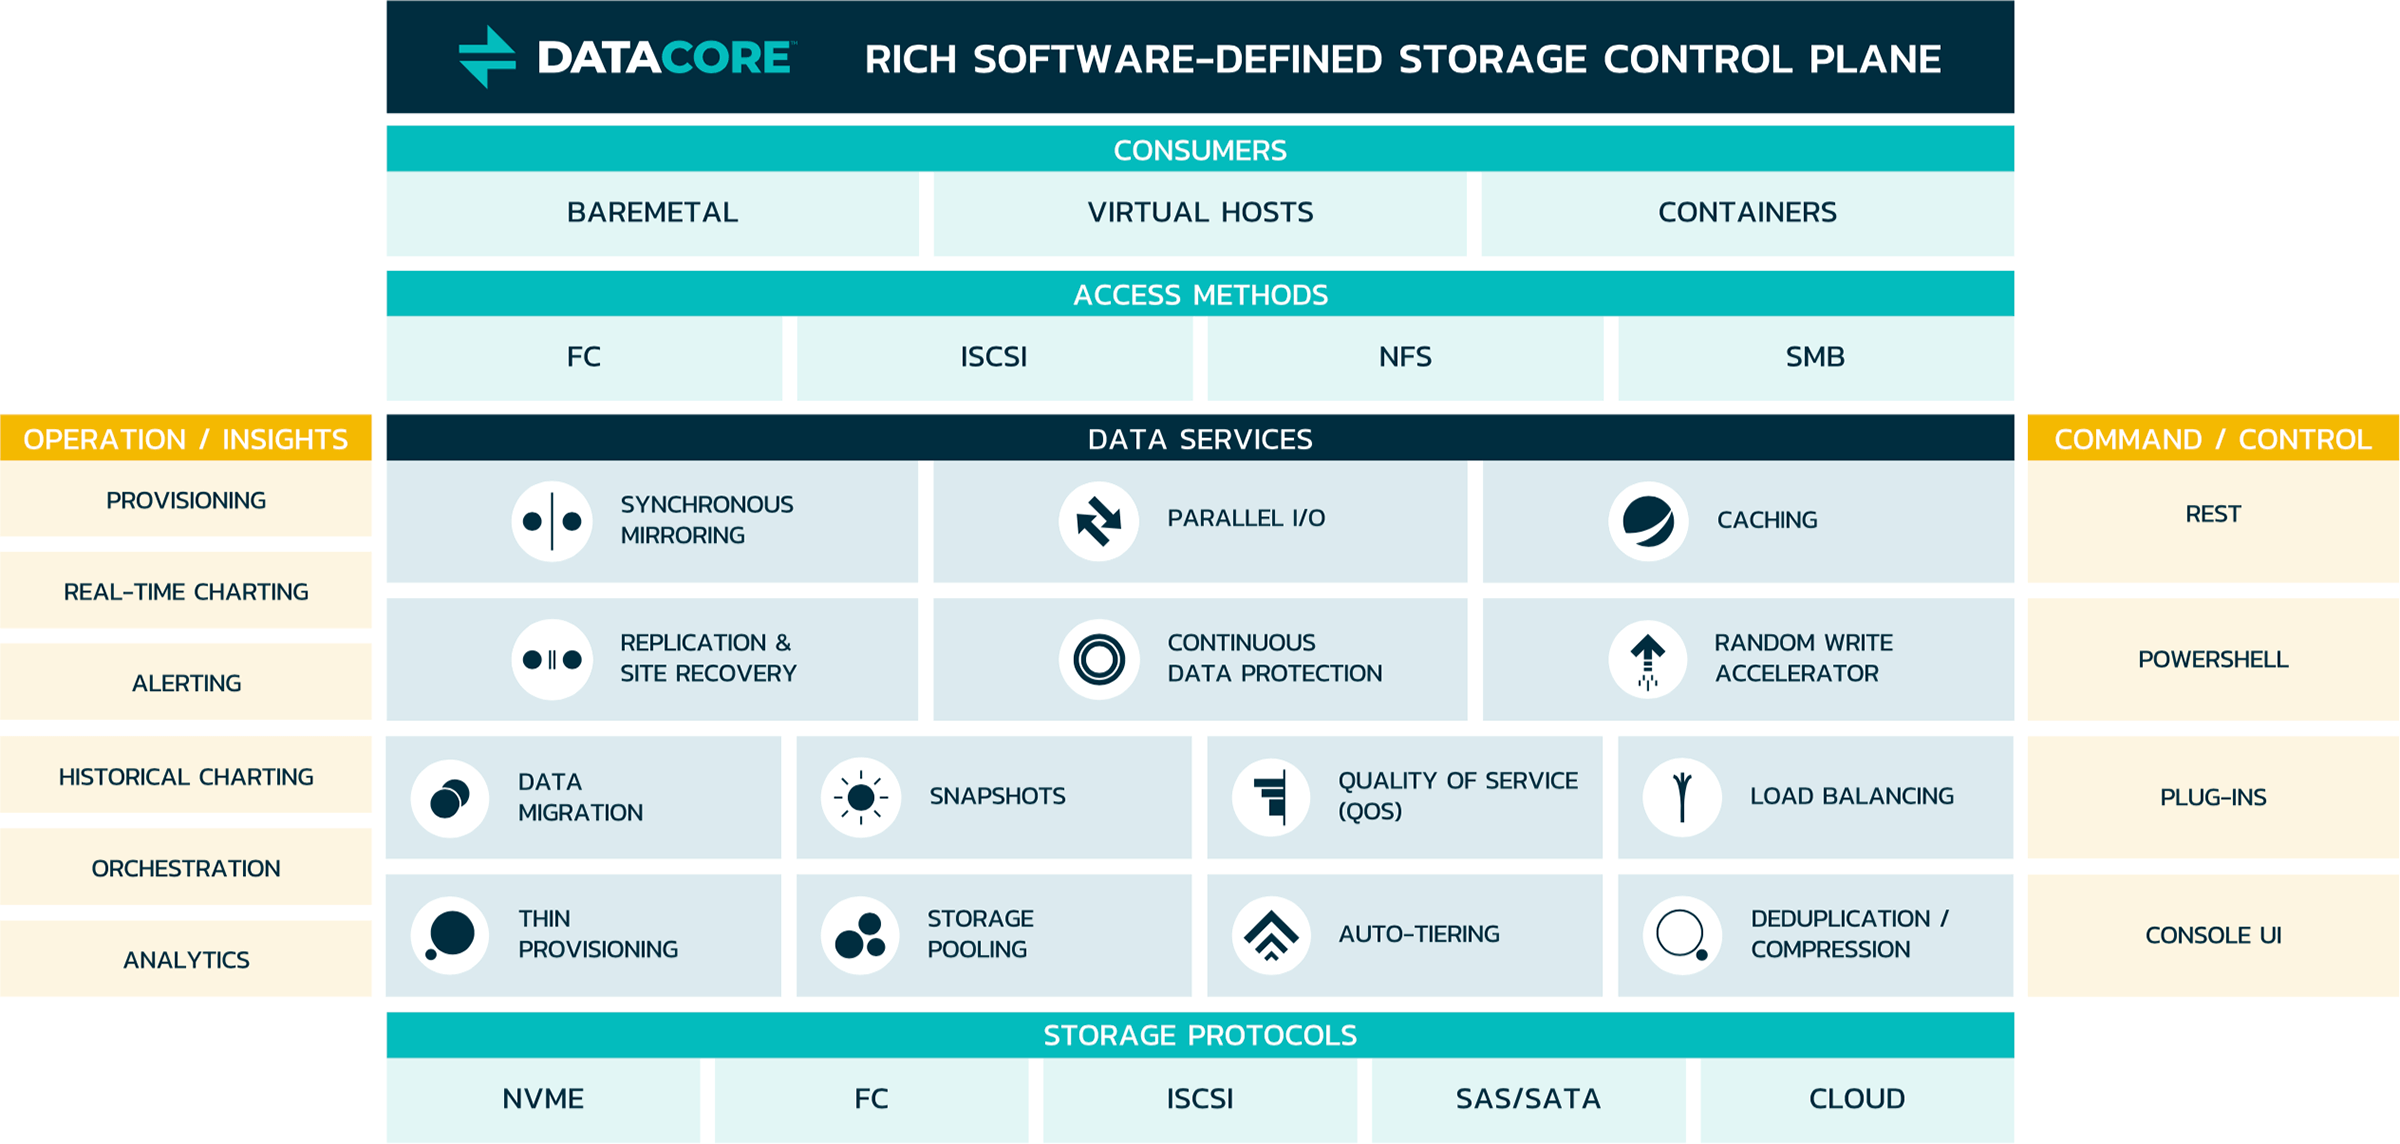 Rich Software-Defined Storage Control Plane